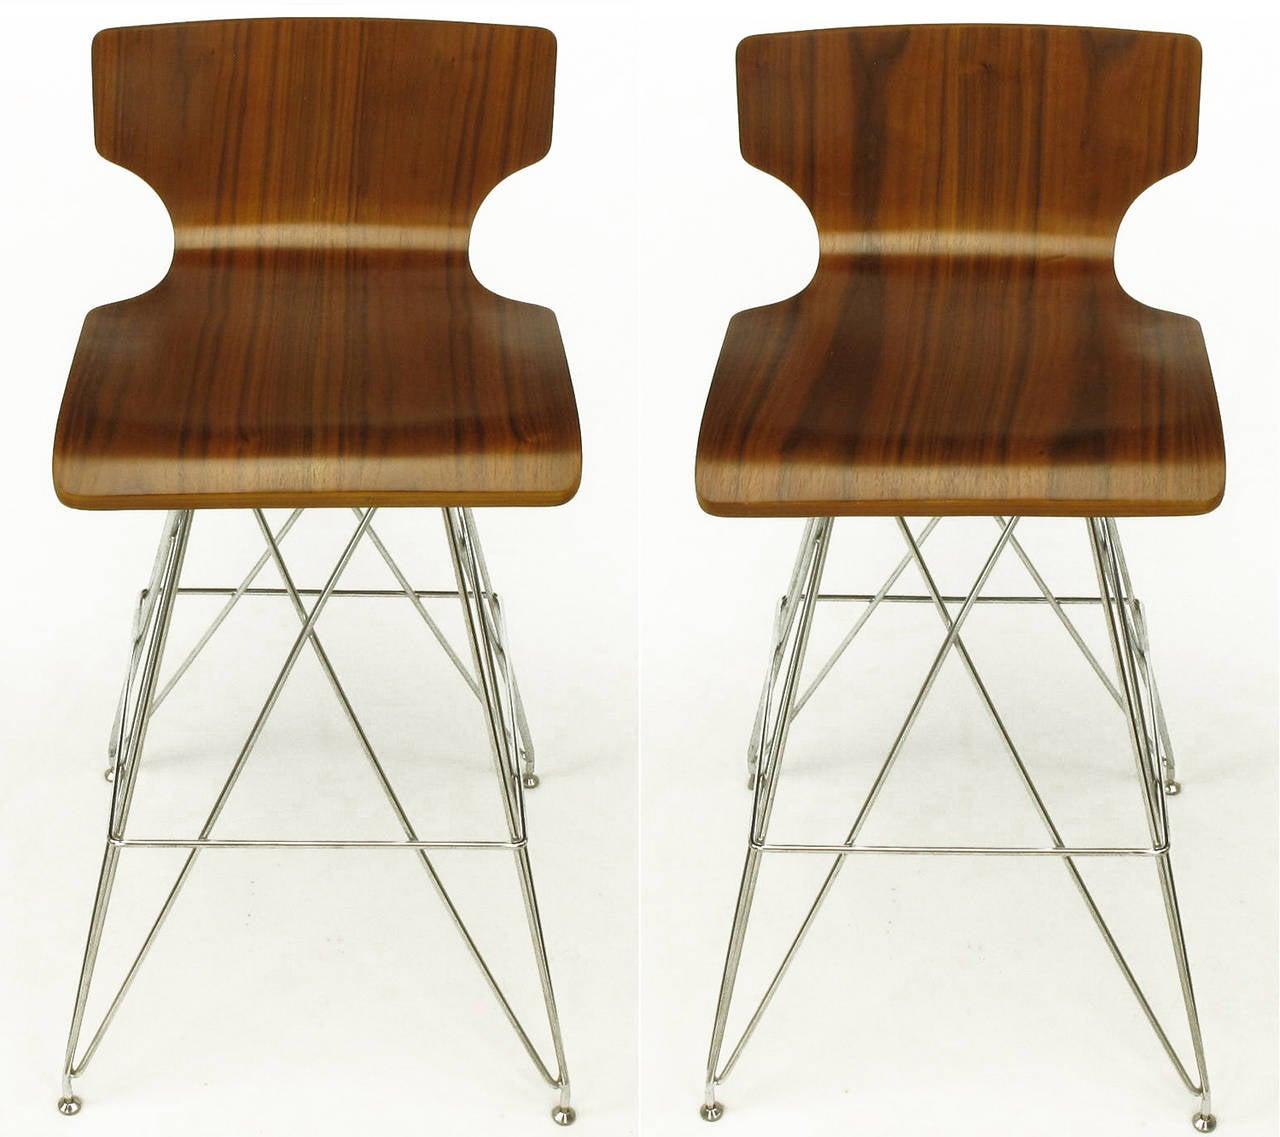 Pair of bentwood seat bar stools with figured teak veneer, low backs and chromed steel